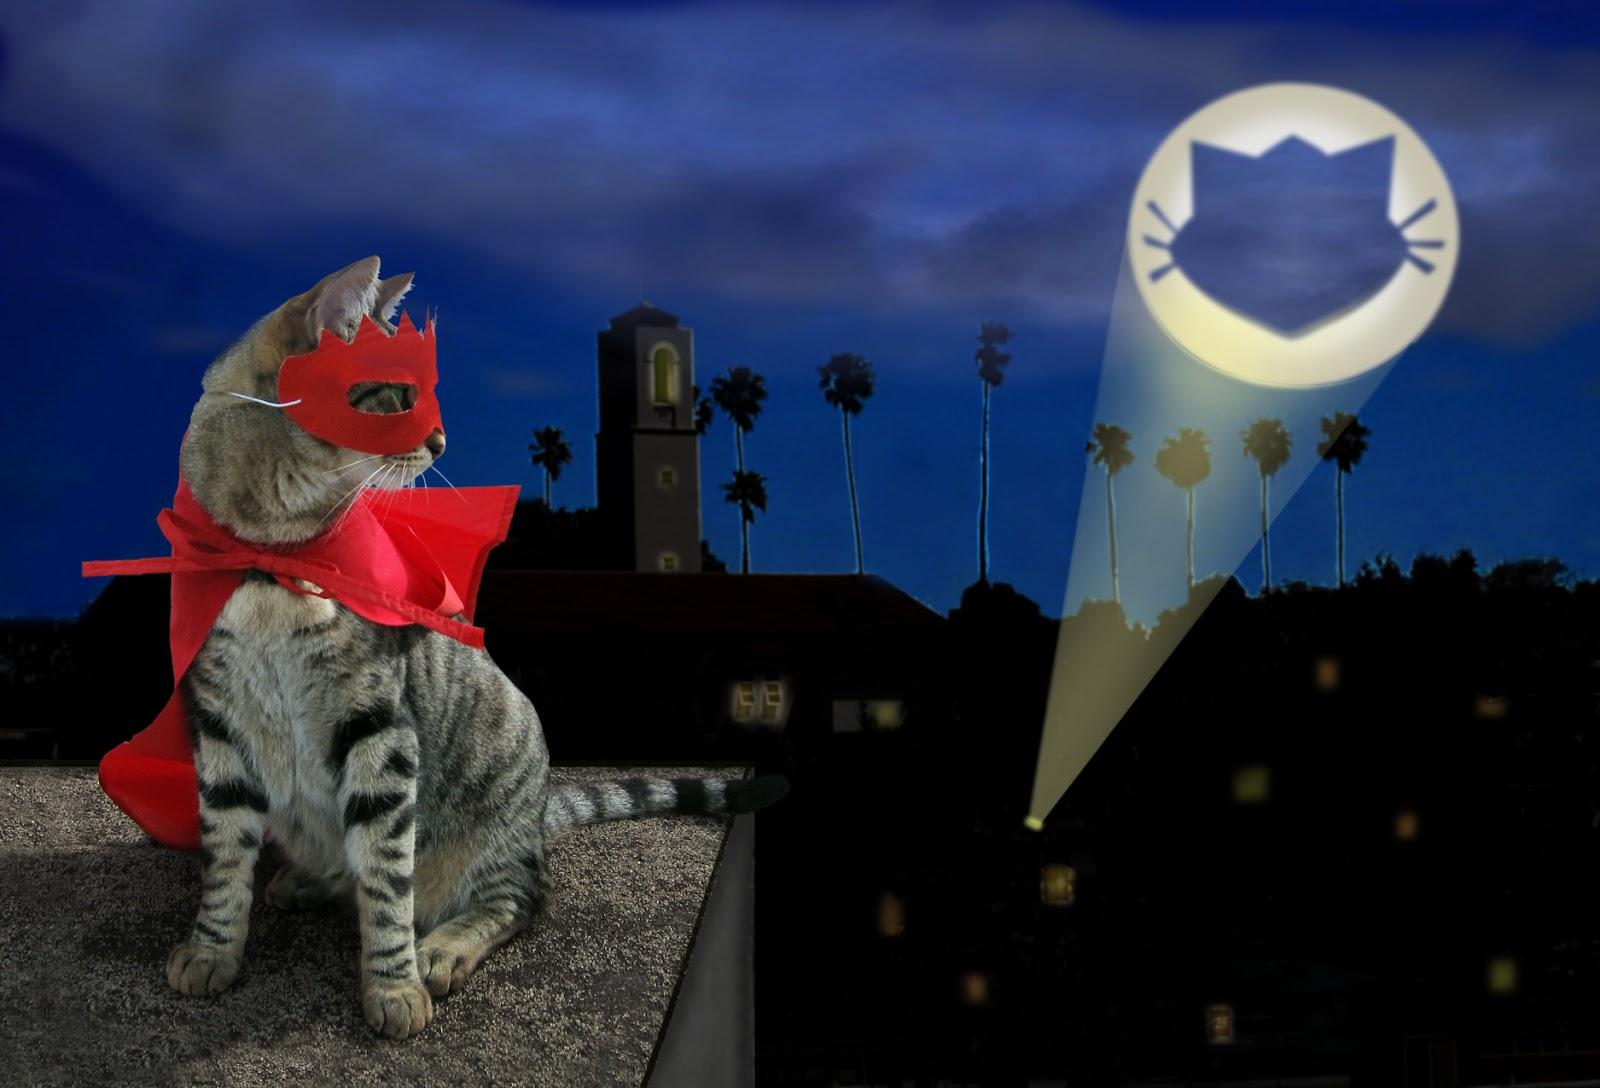 cat-signal1.jpg